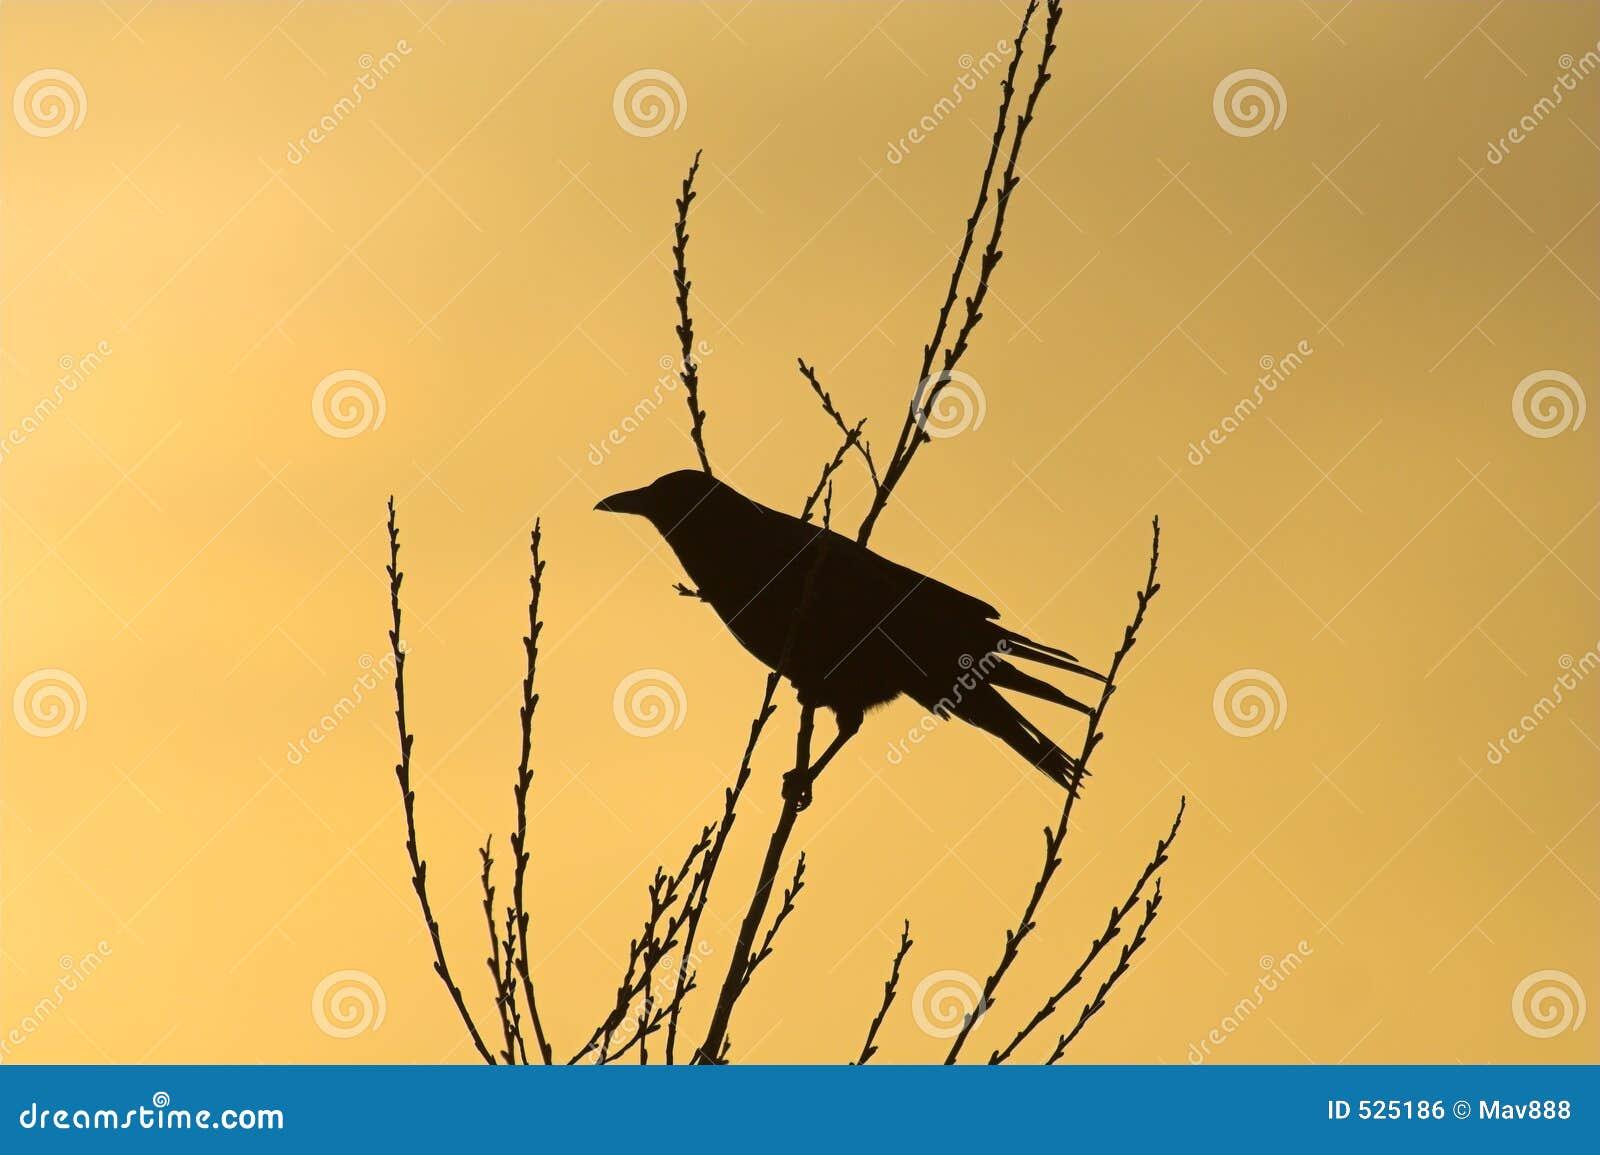 Download 乌鸦剪影 库存照片. 图片 包括有 自然, 枝杈, 白兰地酒, 生物, beautifuler, 黑暗, 自由 - 525186